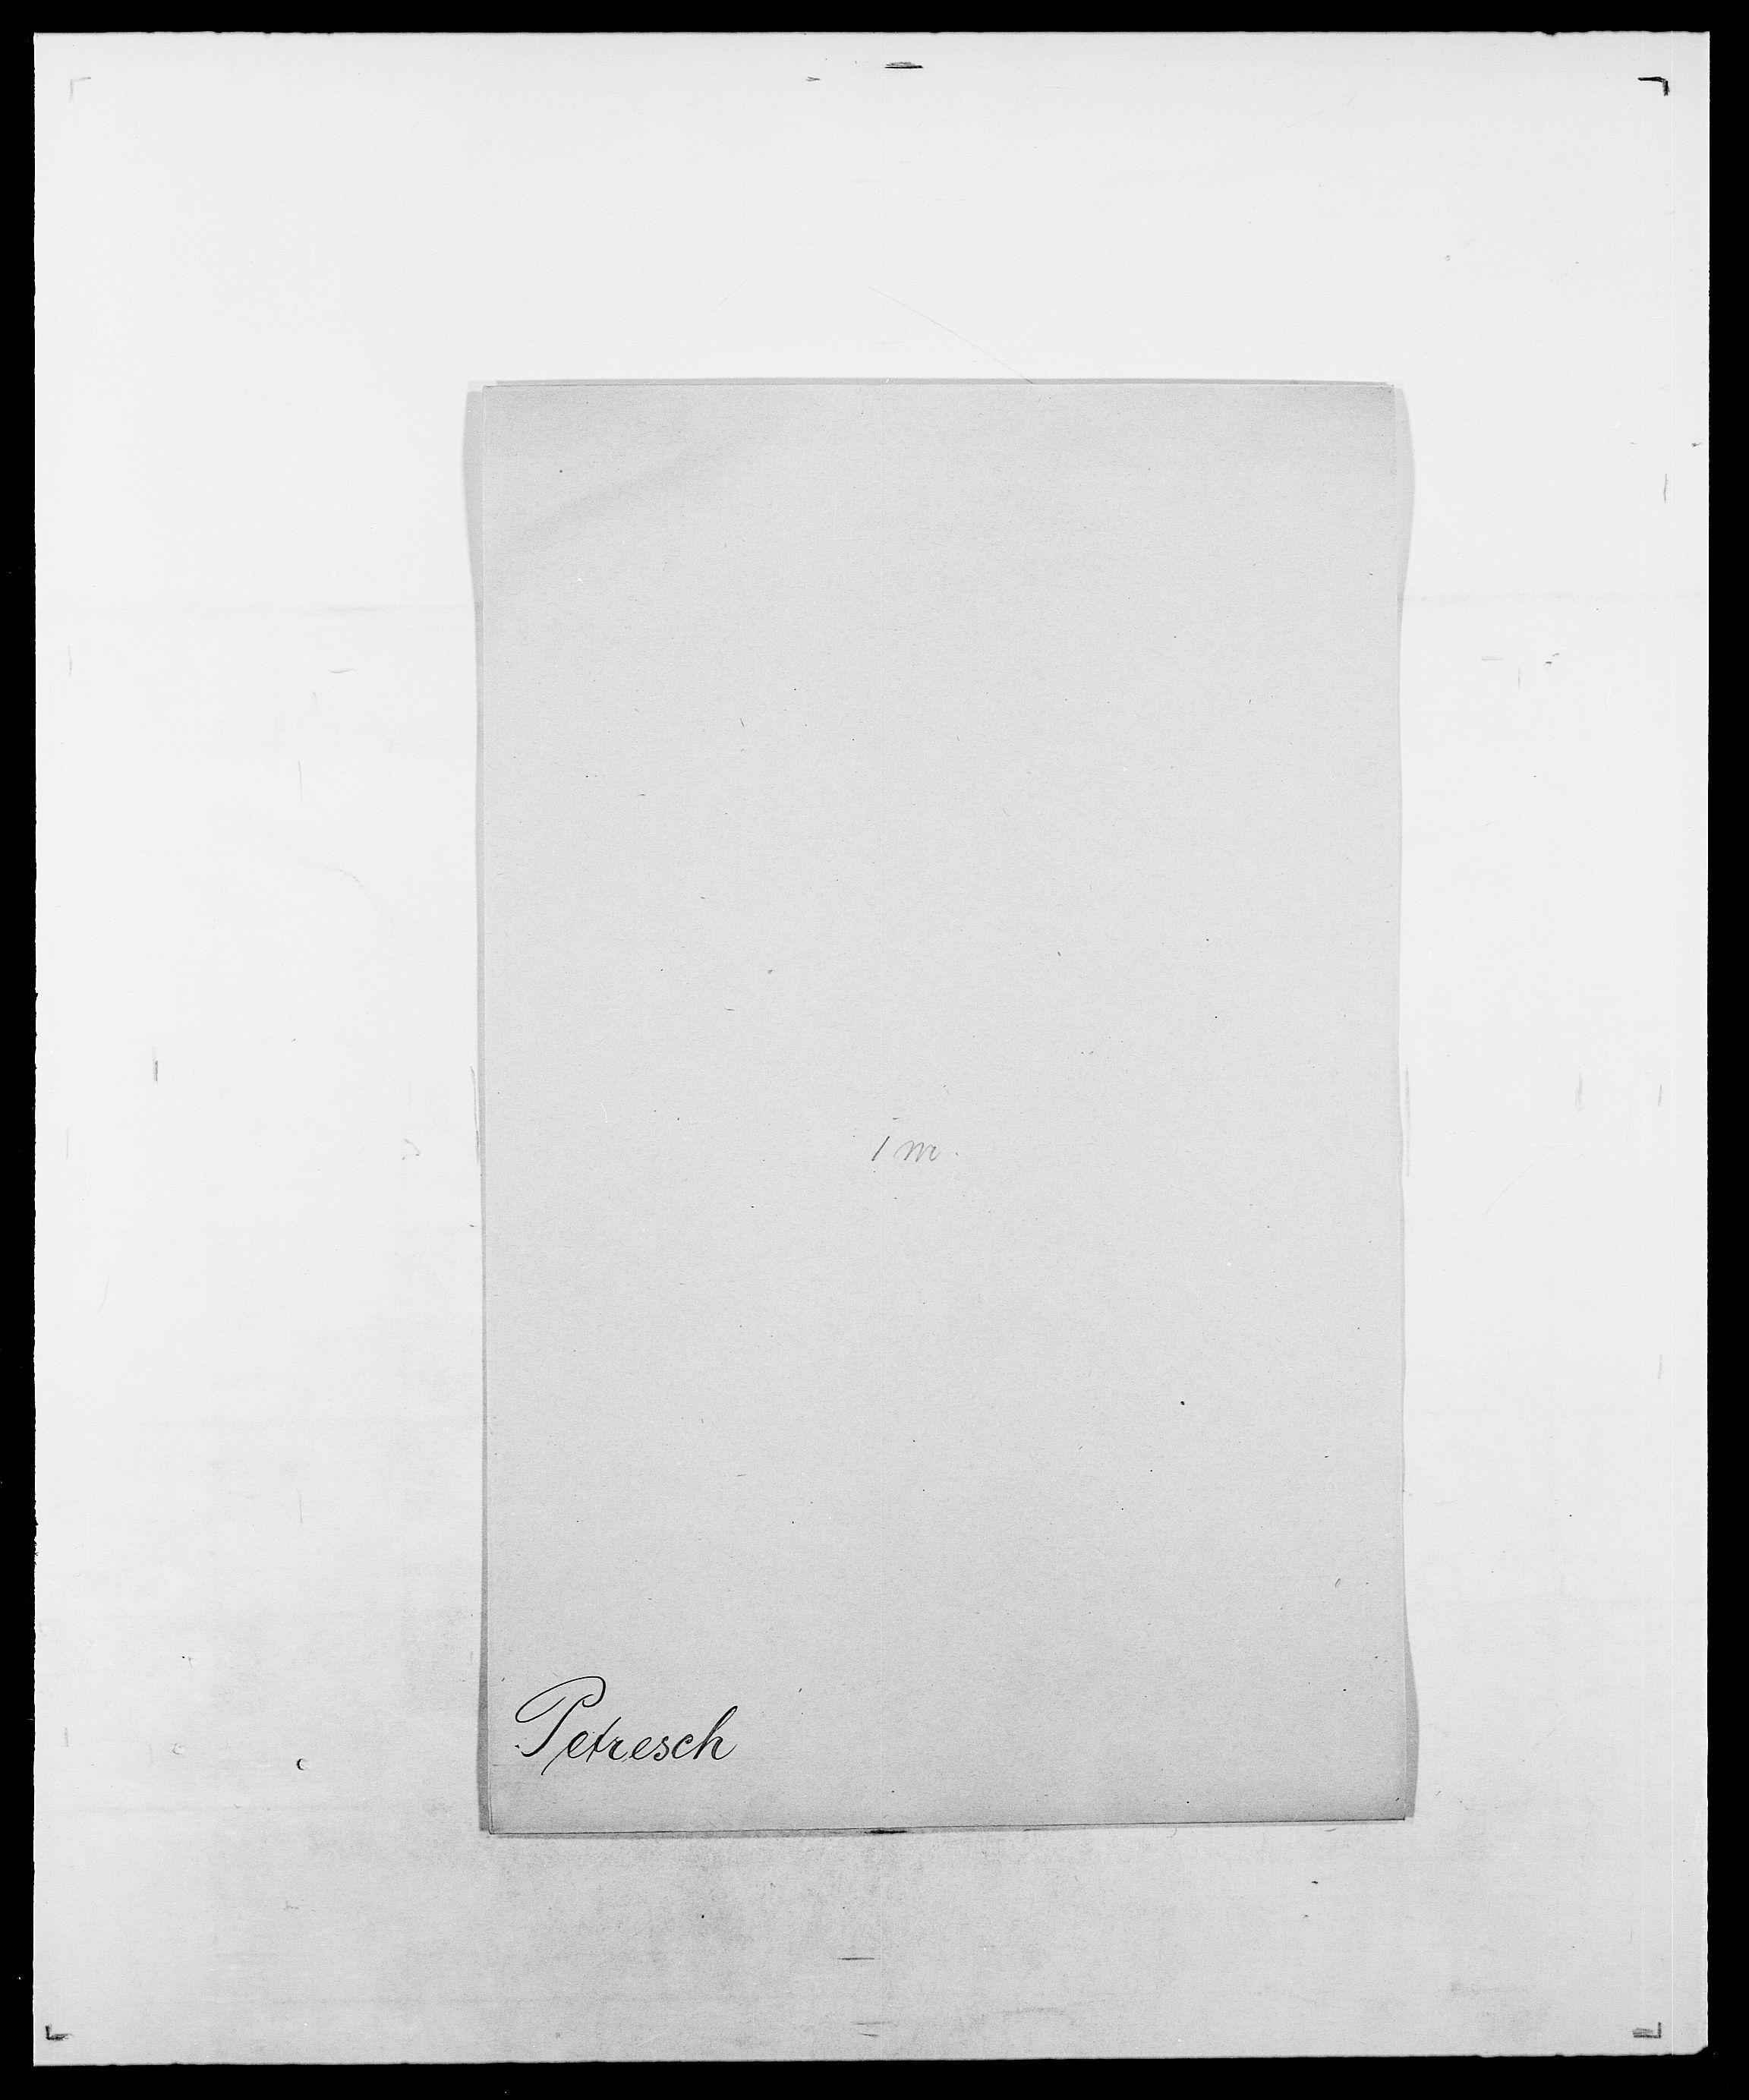 SAO, Delgobe, Charles Antoine - samling, D/Da/L0030: Paars - Pittelkov, s. 459